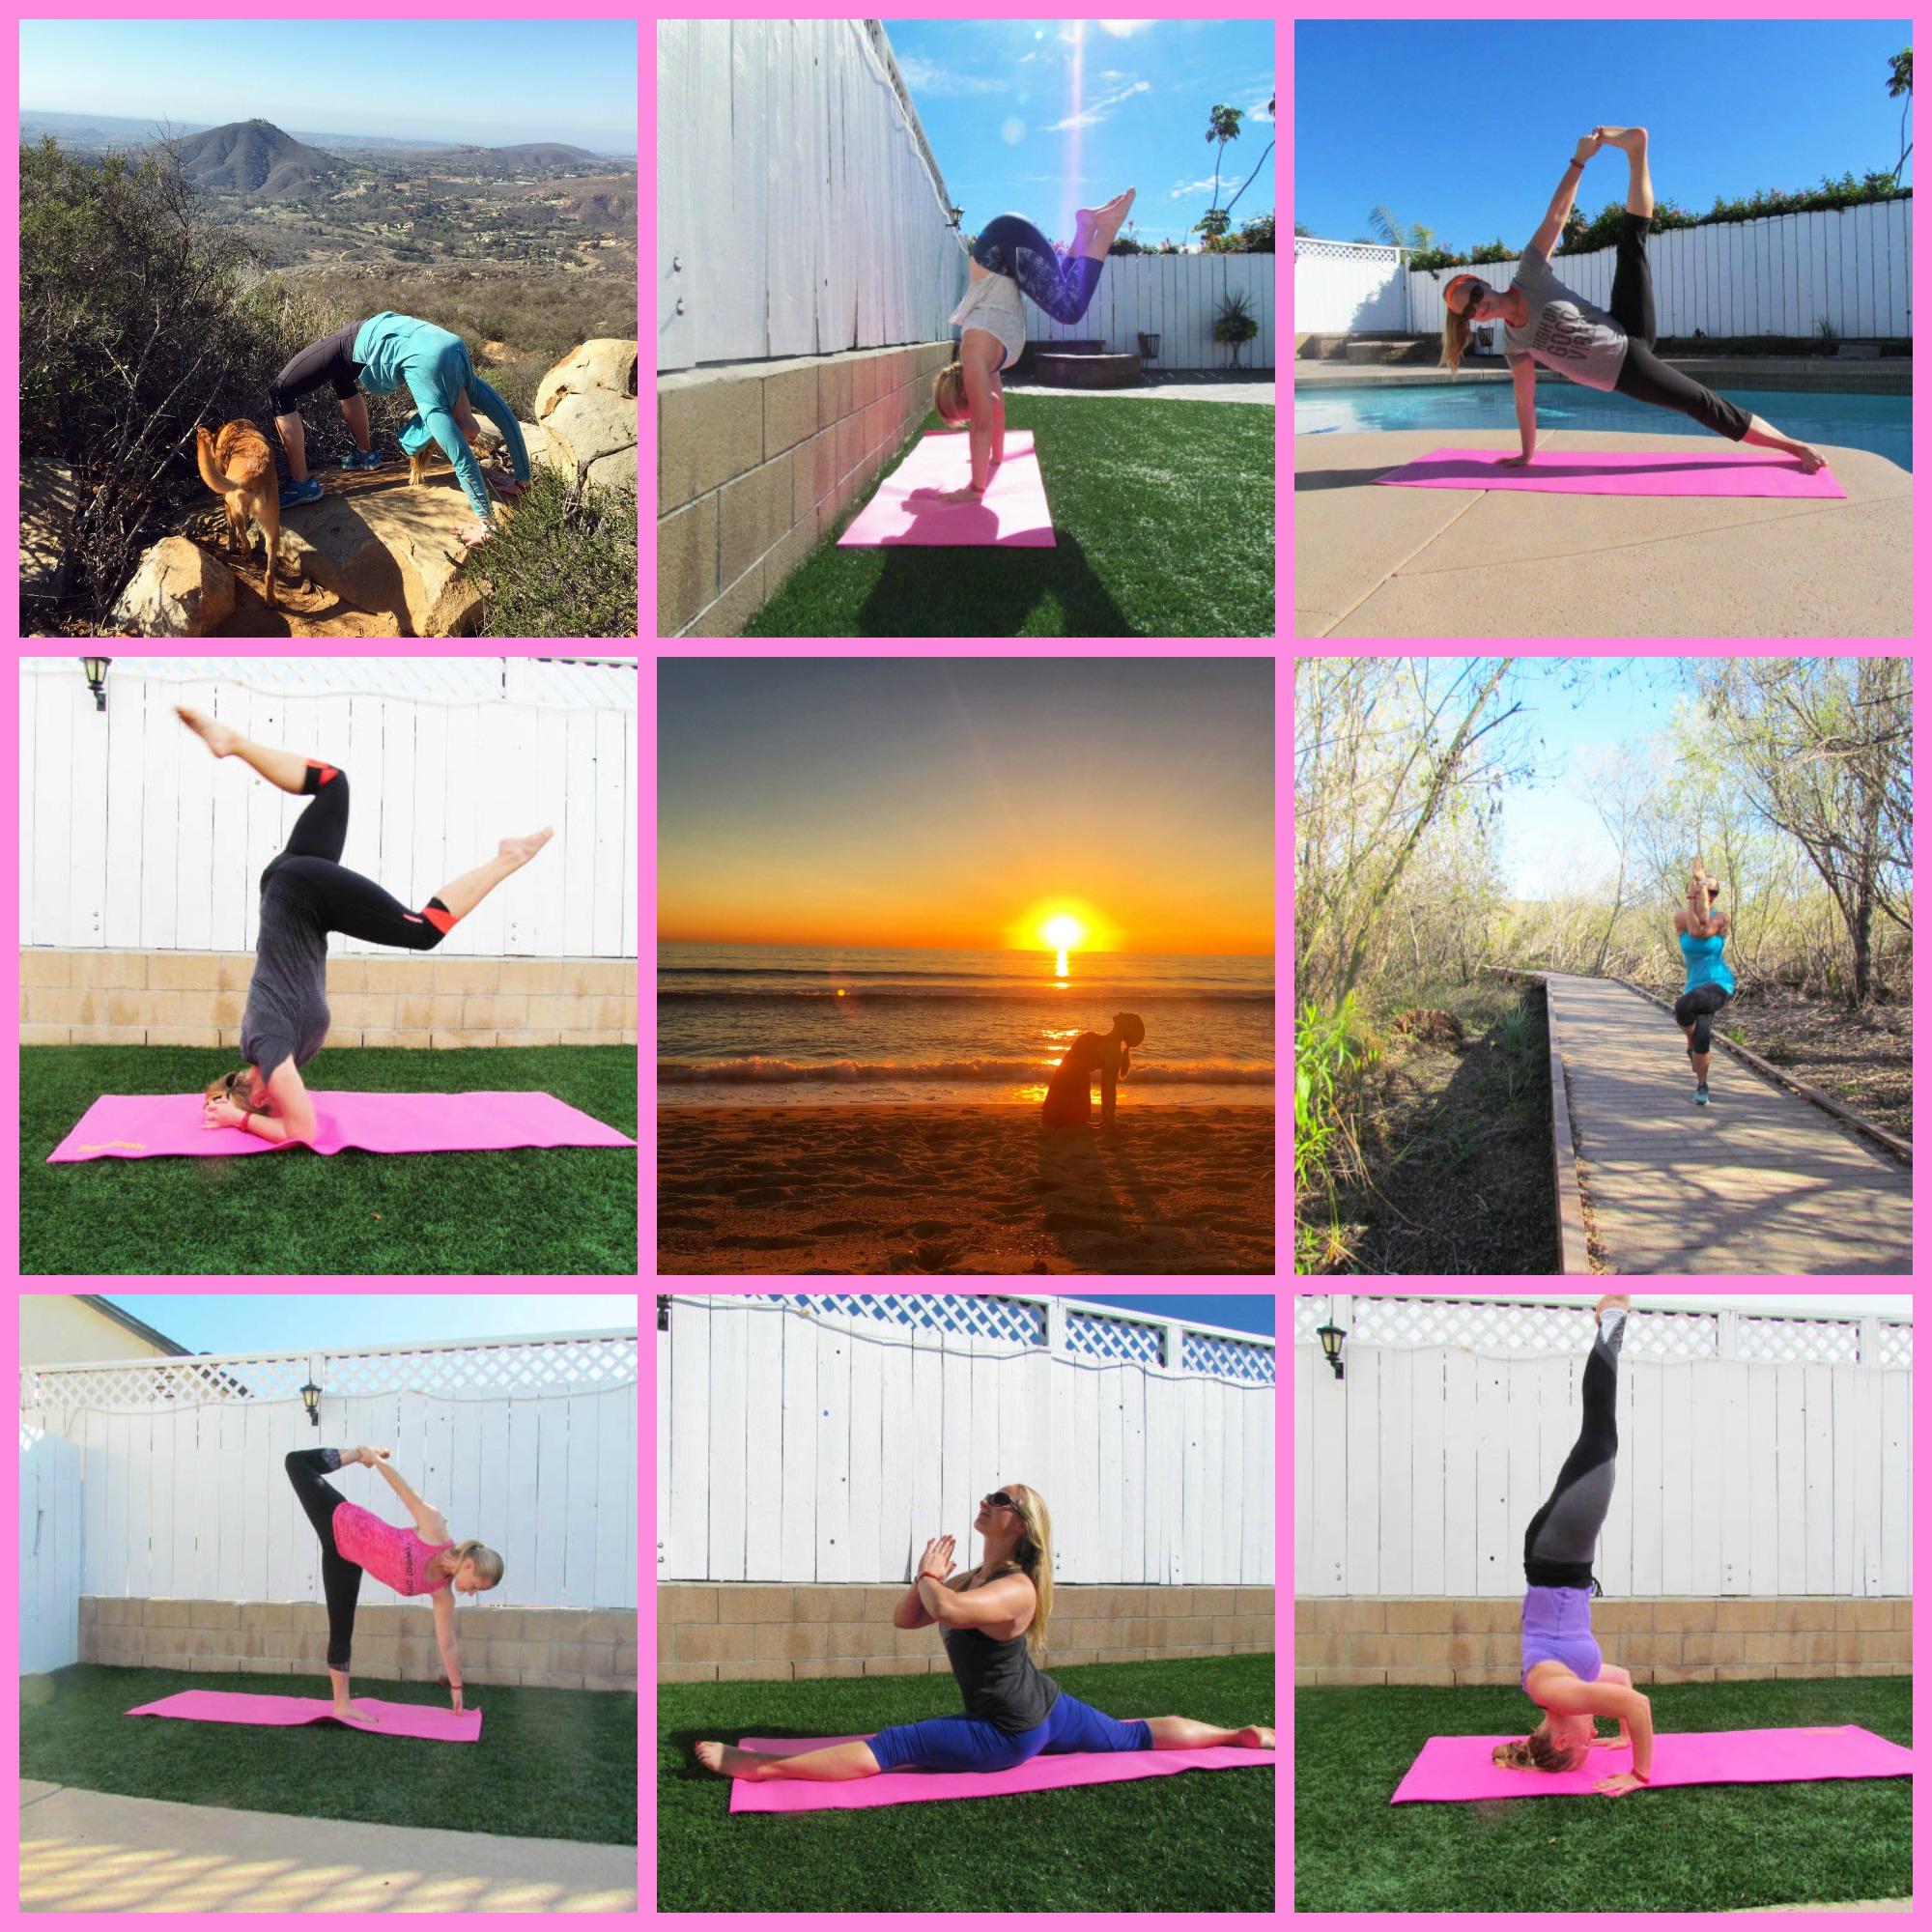 My February Yoga Practice: Three Poses I'm Working On ...